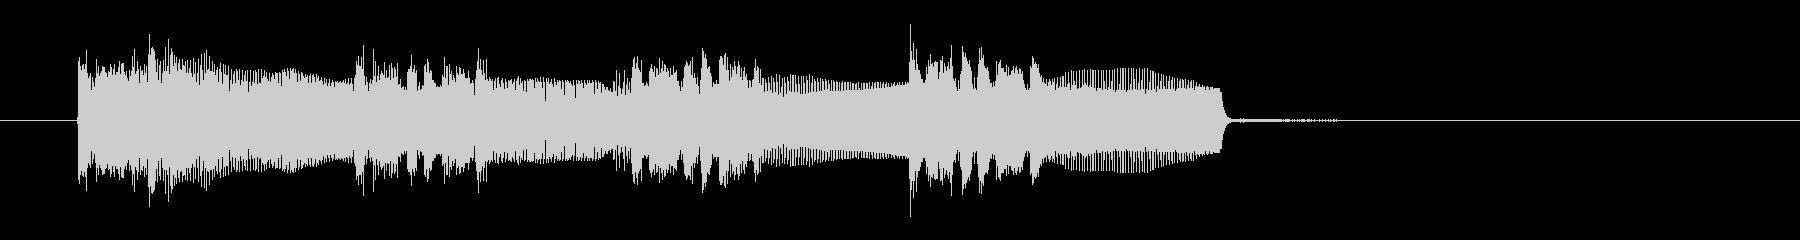 BGM of futuristic sense by synthesizer's unreproduced waveform